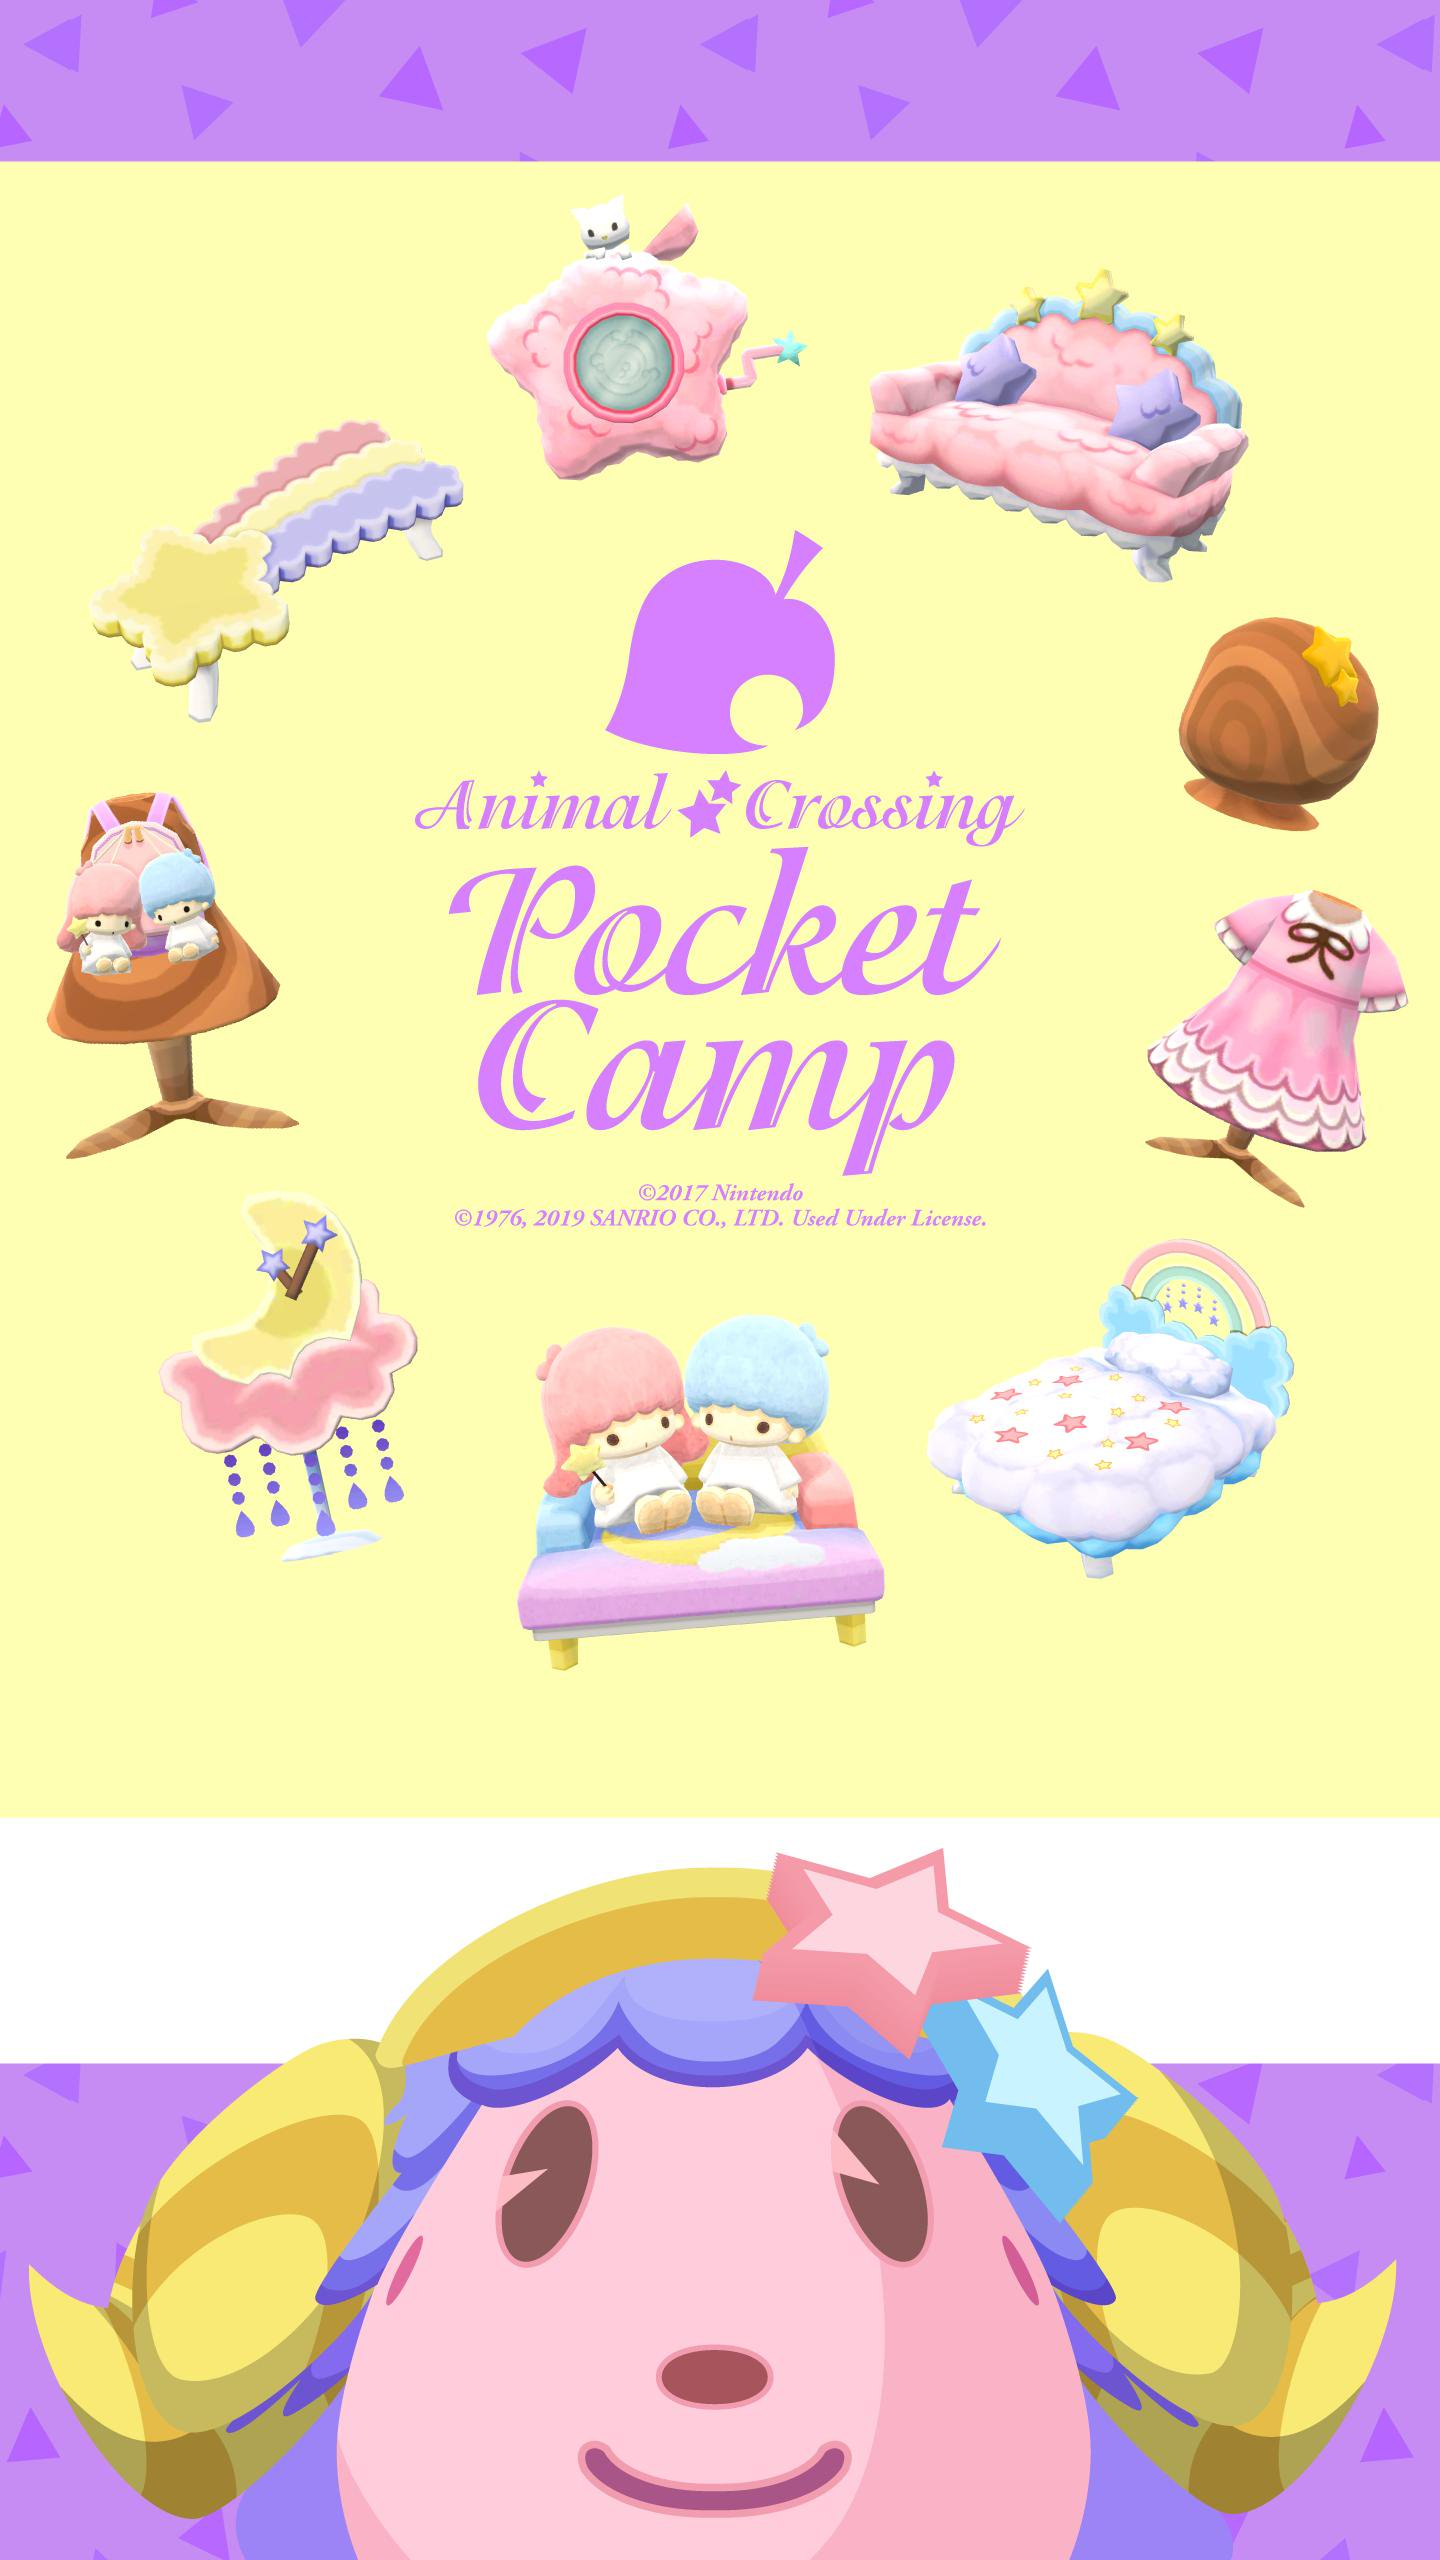 Nintendo Creates Four Sanrio Wallpapers From Animal Crossing